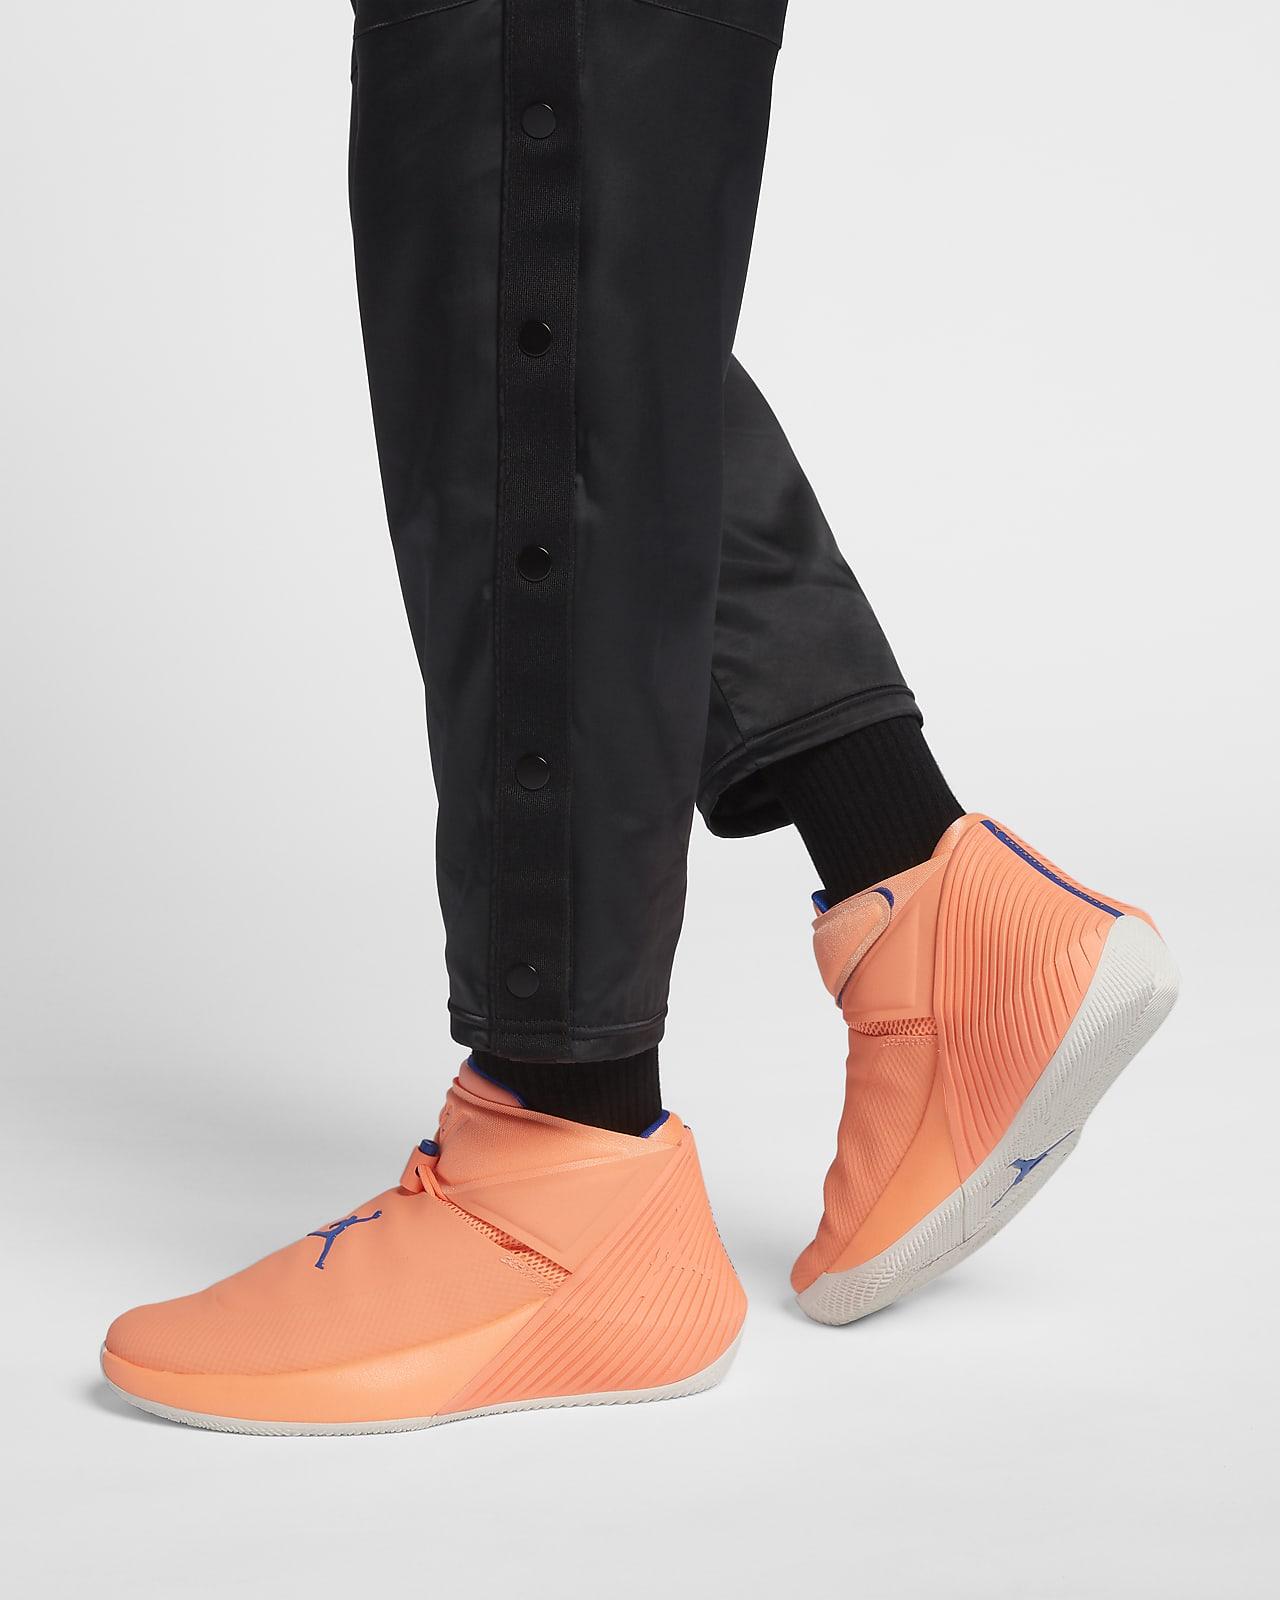 Jordan 'Why Not?' ZER0.1 Men's Basketball Shoe